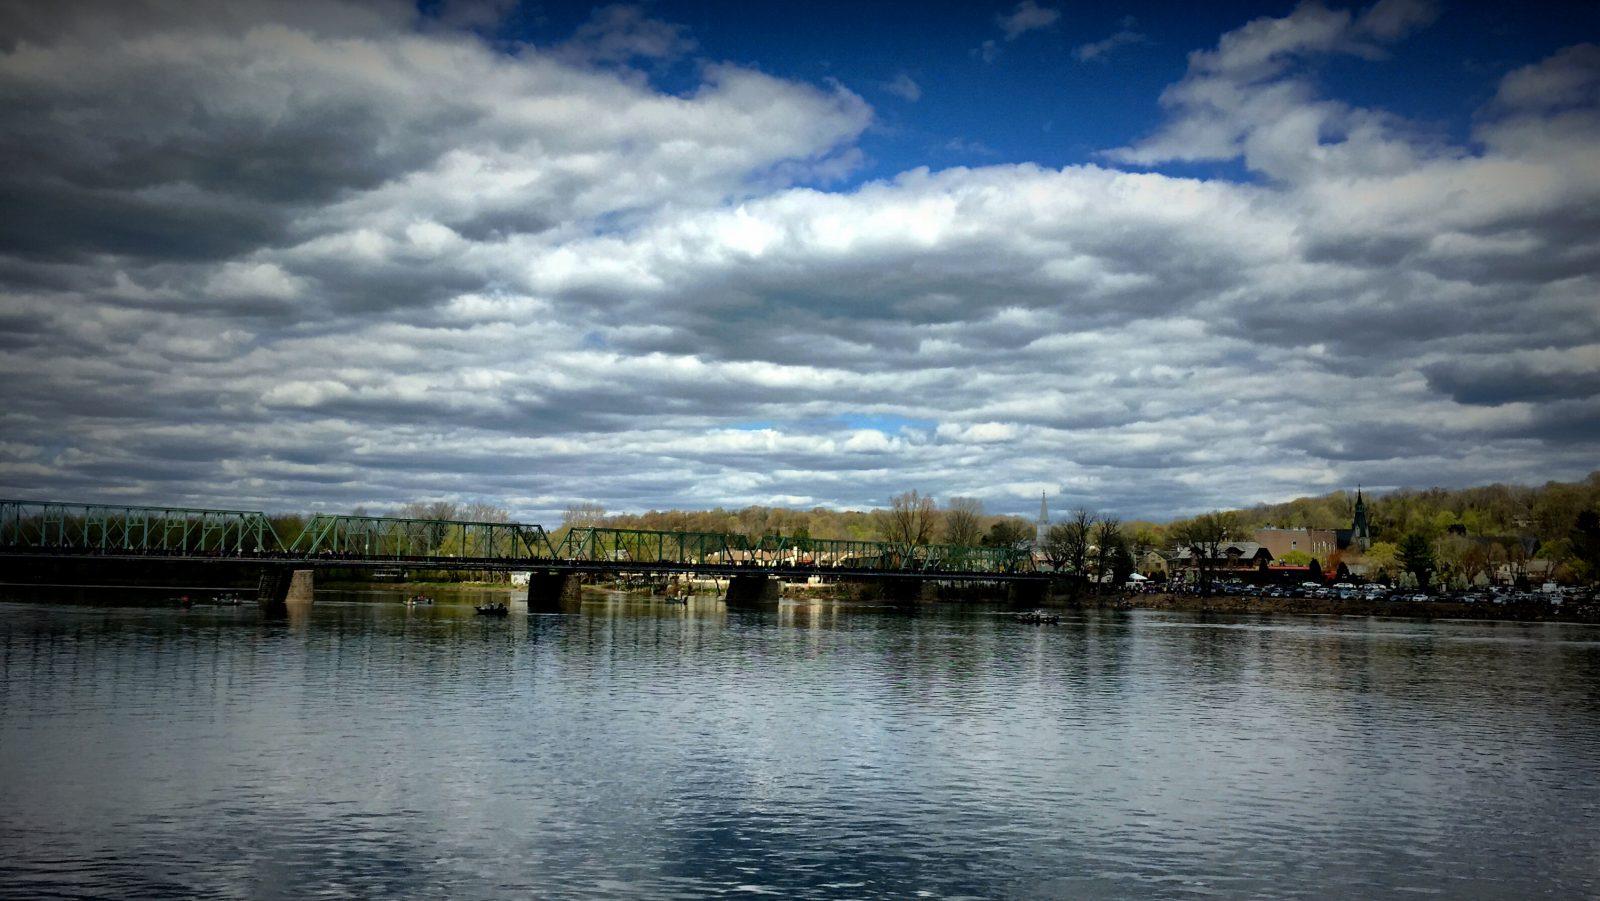 Bucks County, Pennsylvania, New Hope, River, Bridge